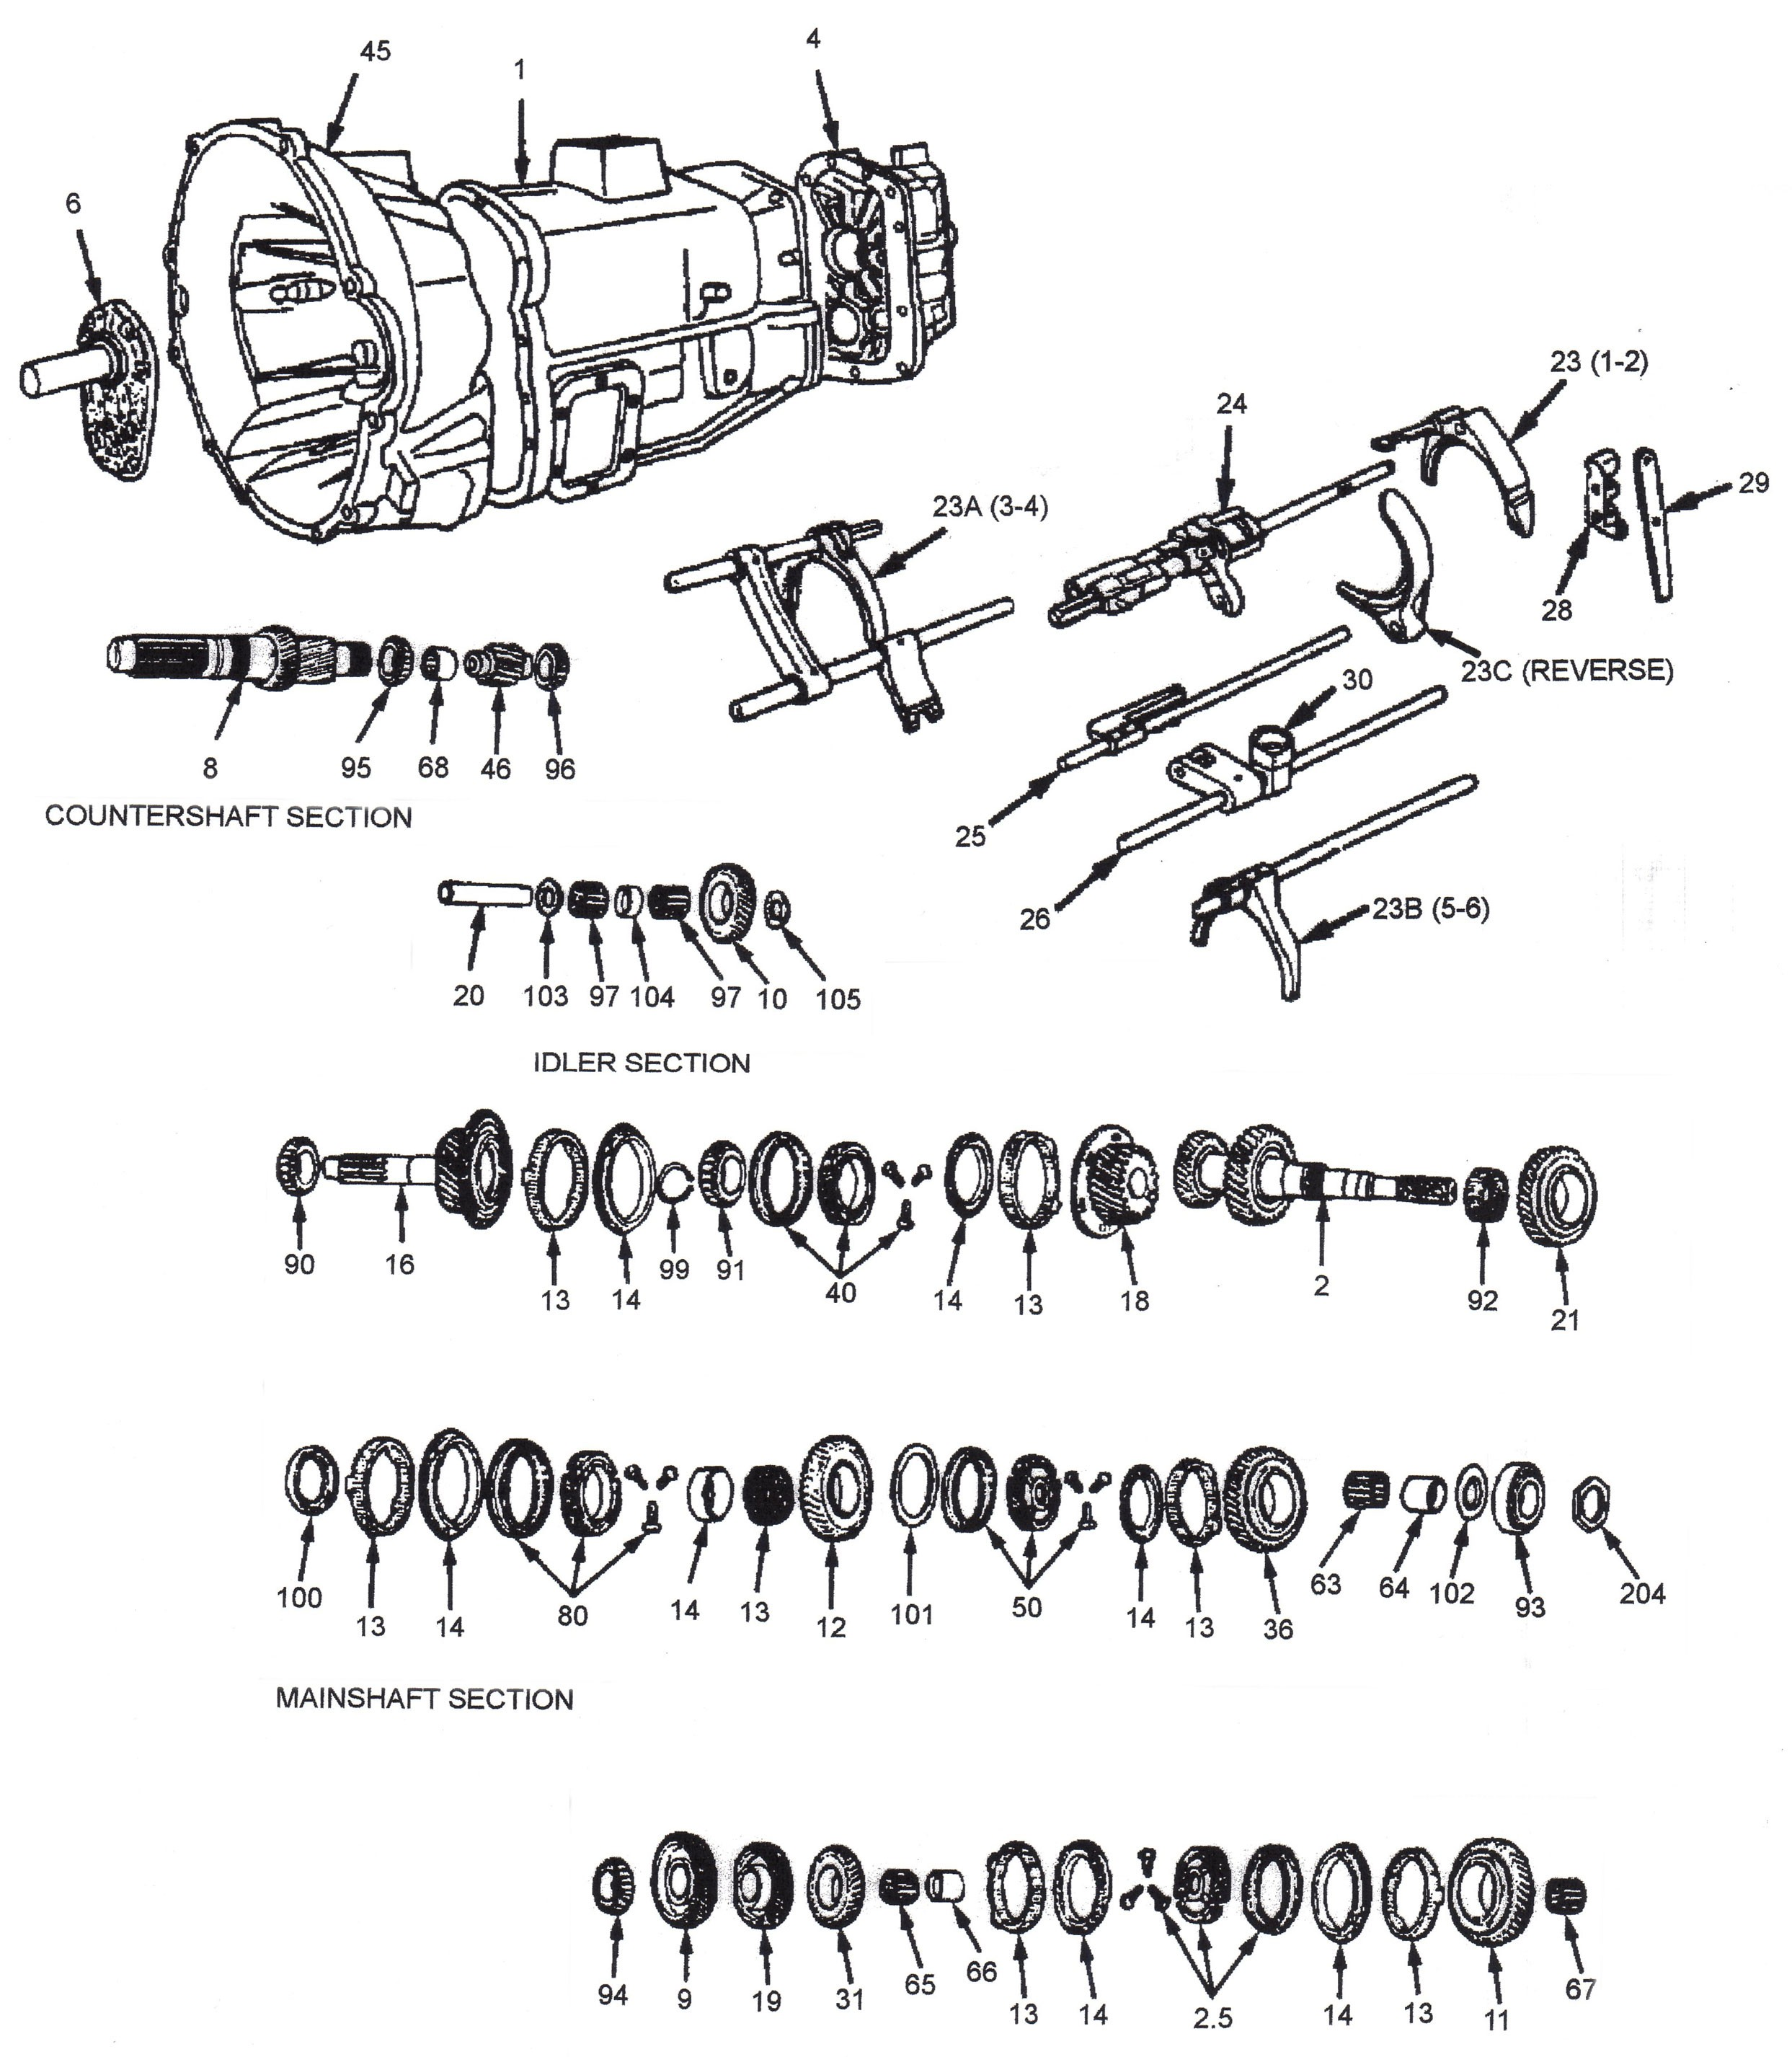 Manual Gearbox    Diagram      My    Wiring       DIagram